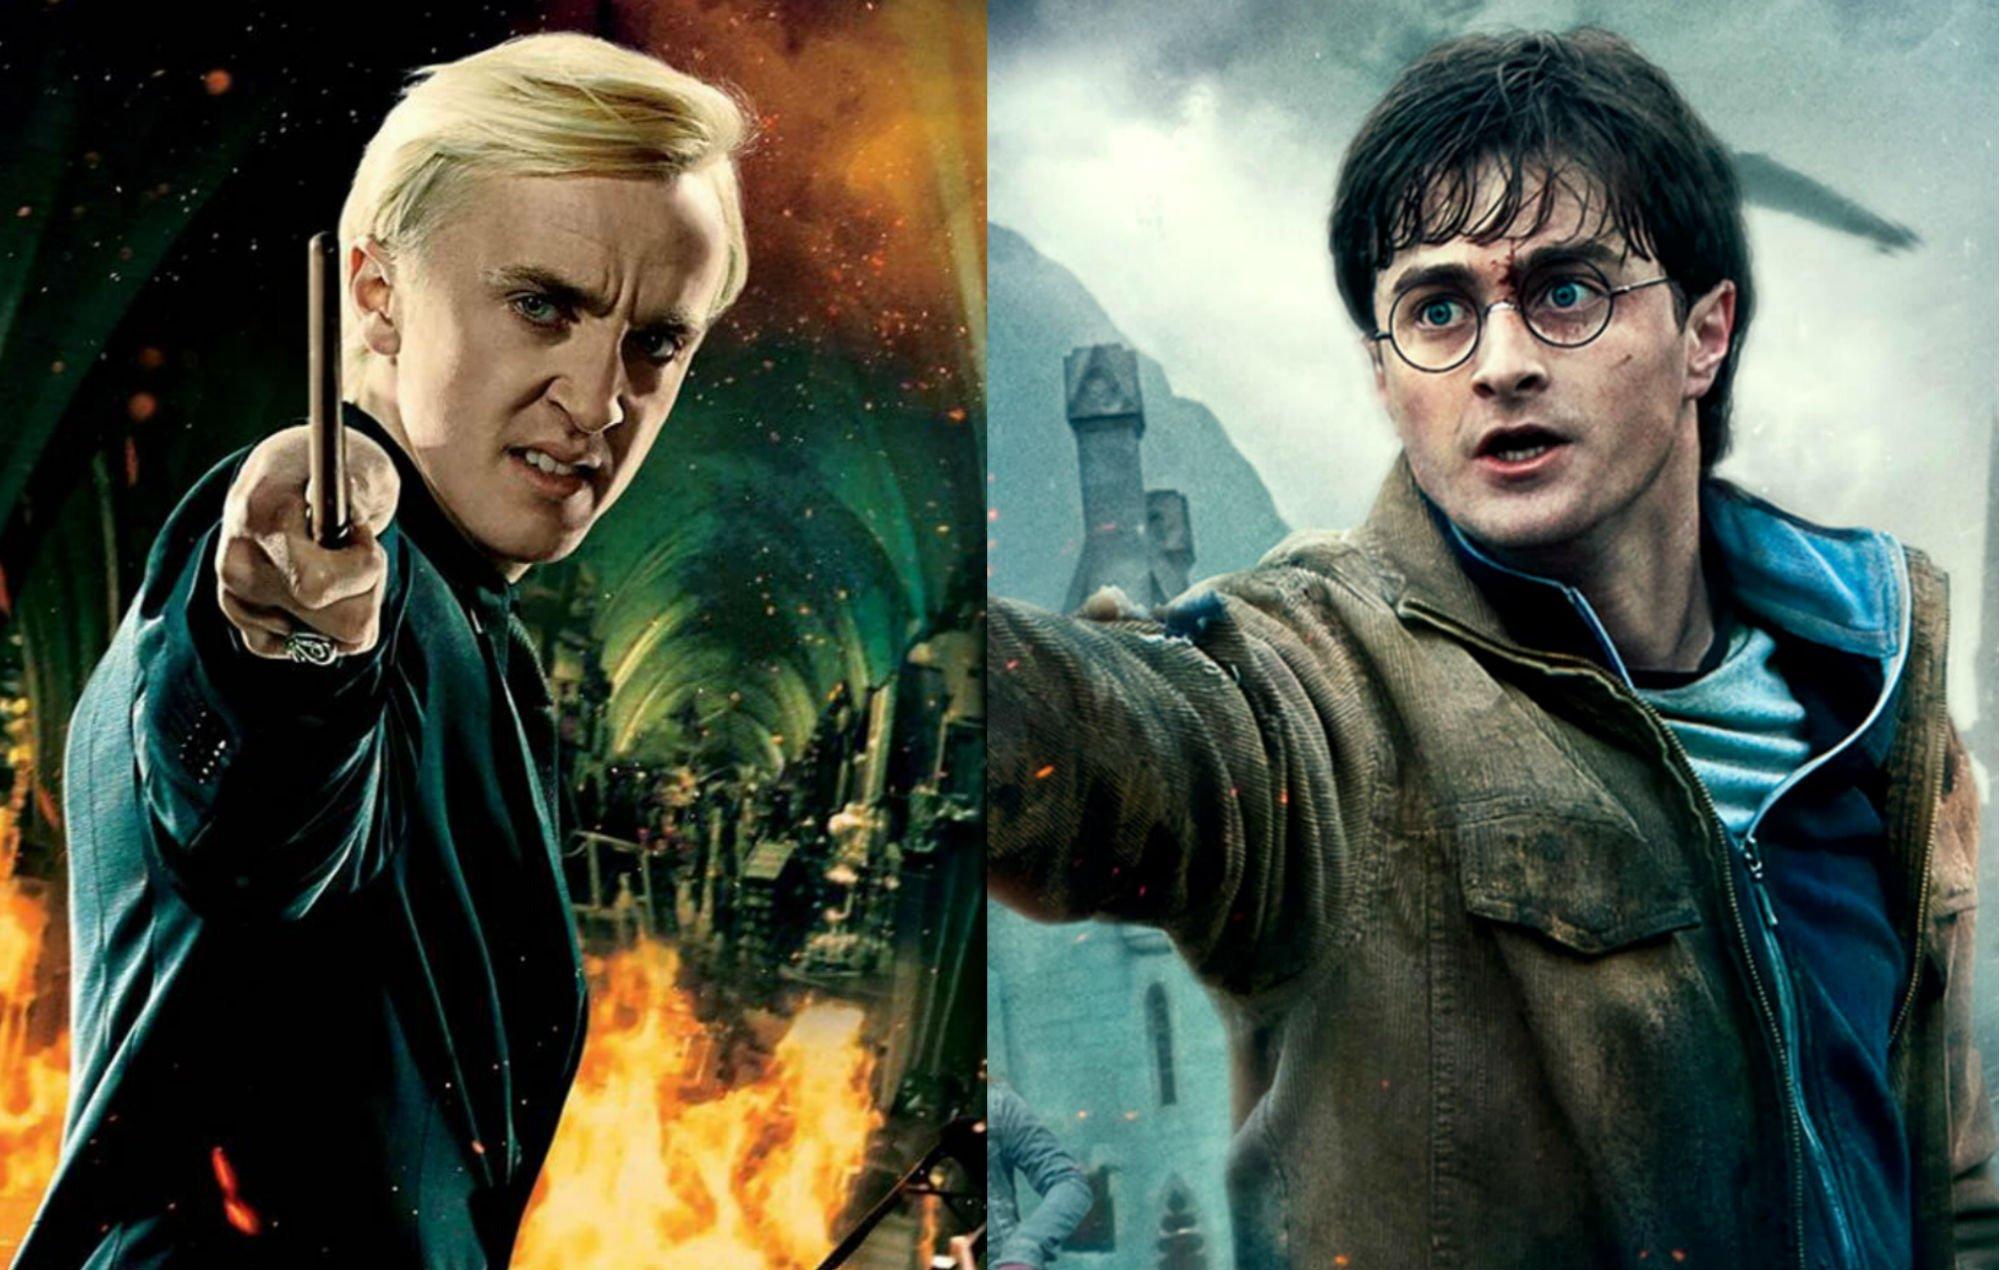 Draco Malfoy actor